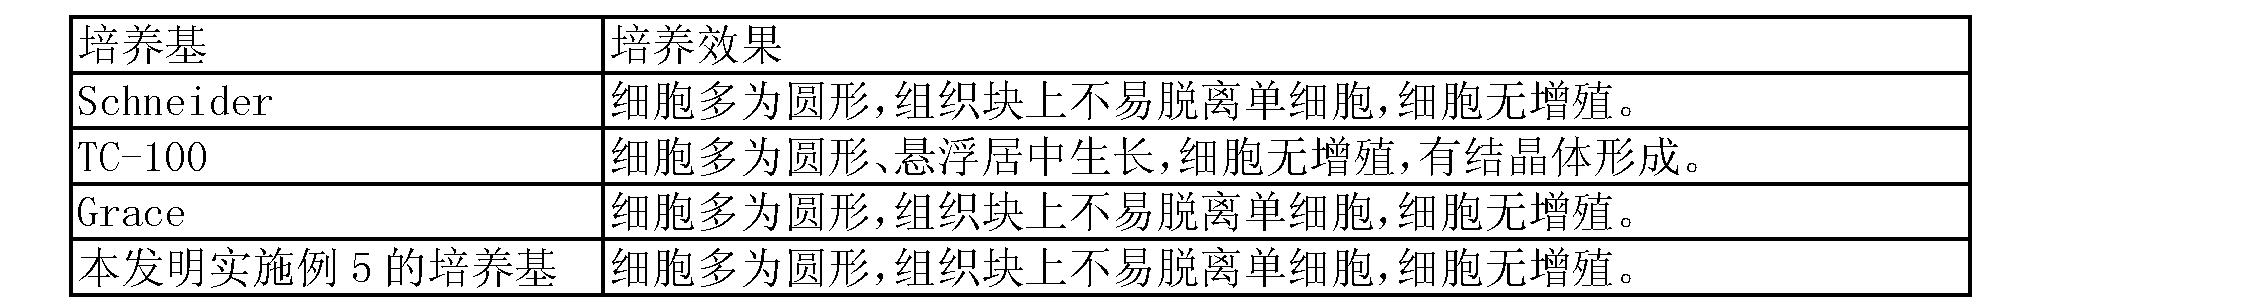 Figure CN102776148AD00171